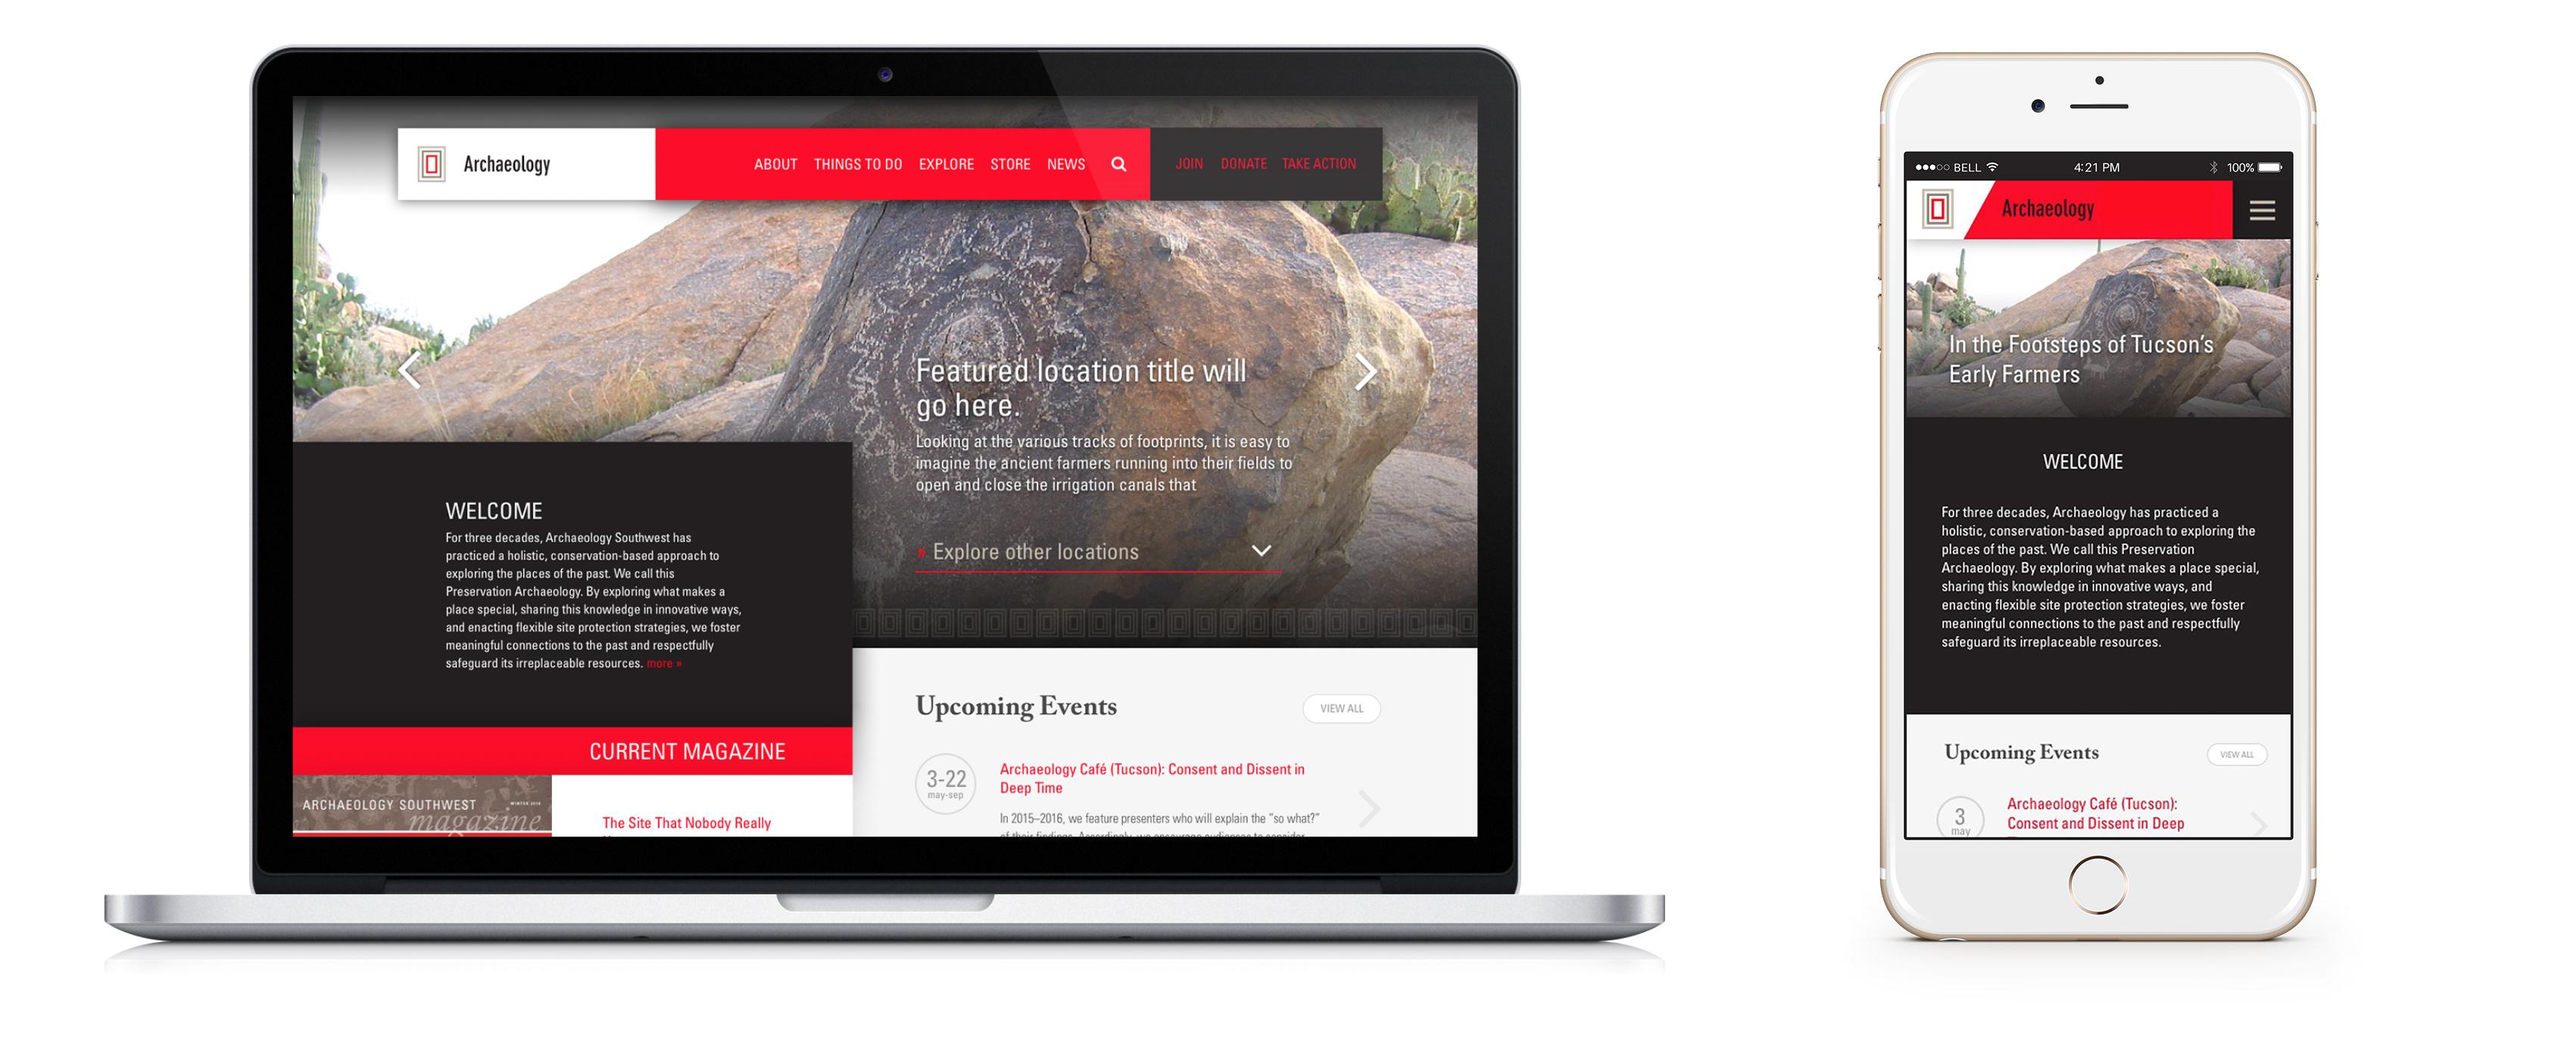 Design A Better Website: Foundations First - Image 12